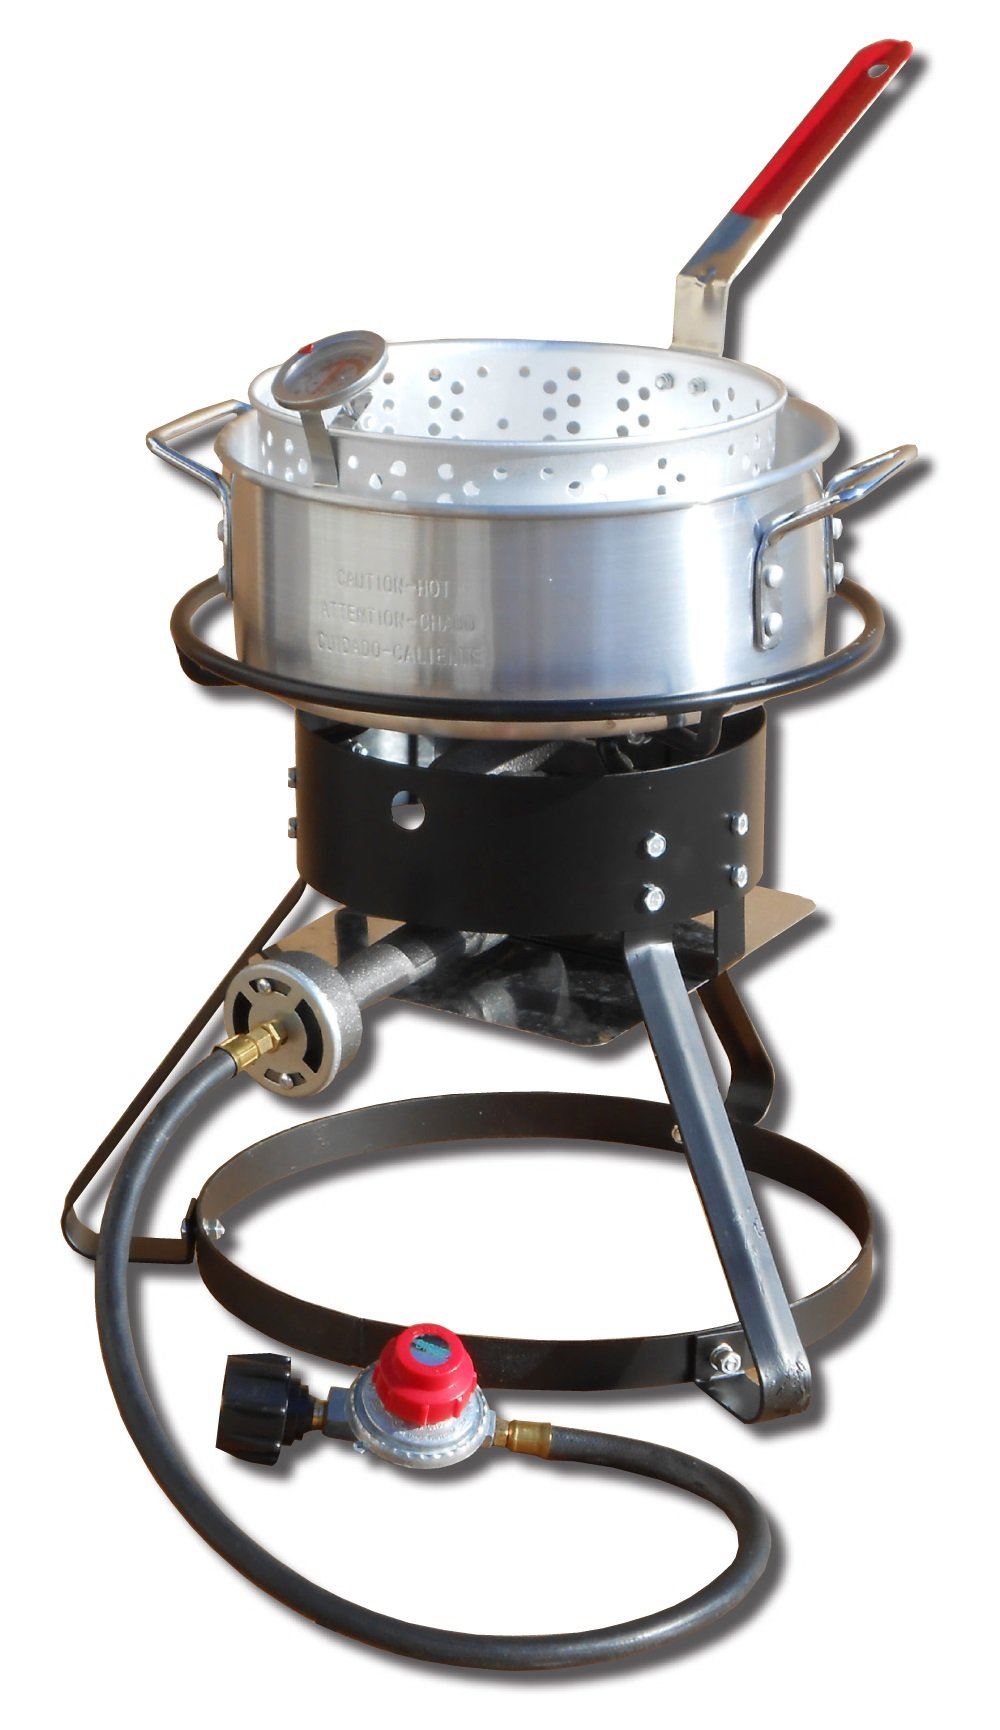 King Kooker 1217 Outdoor Cooker Set, Silver